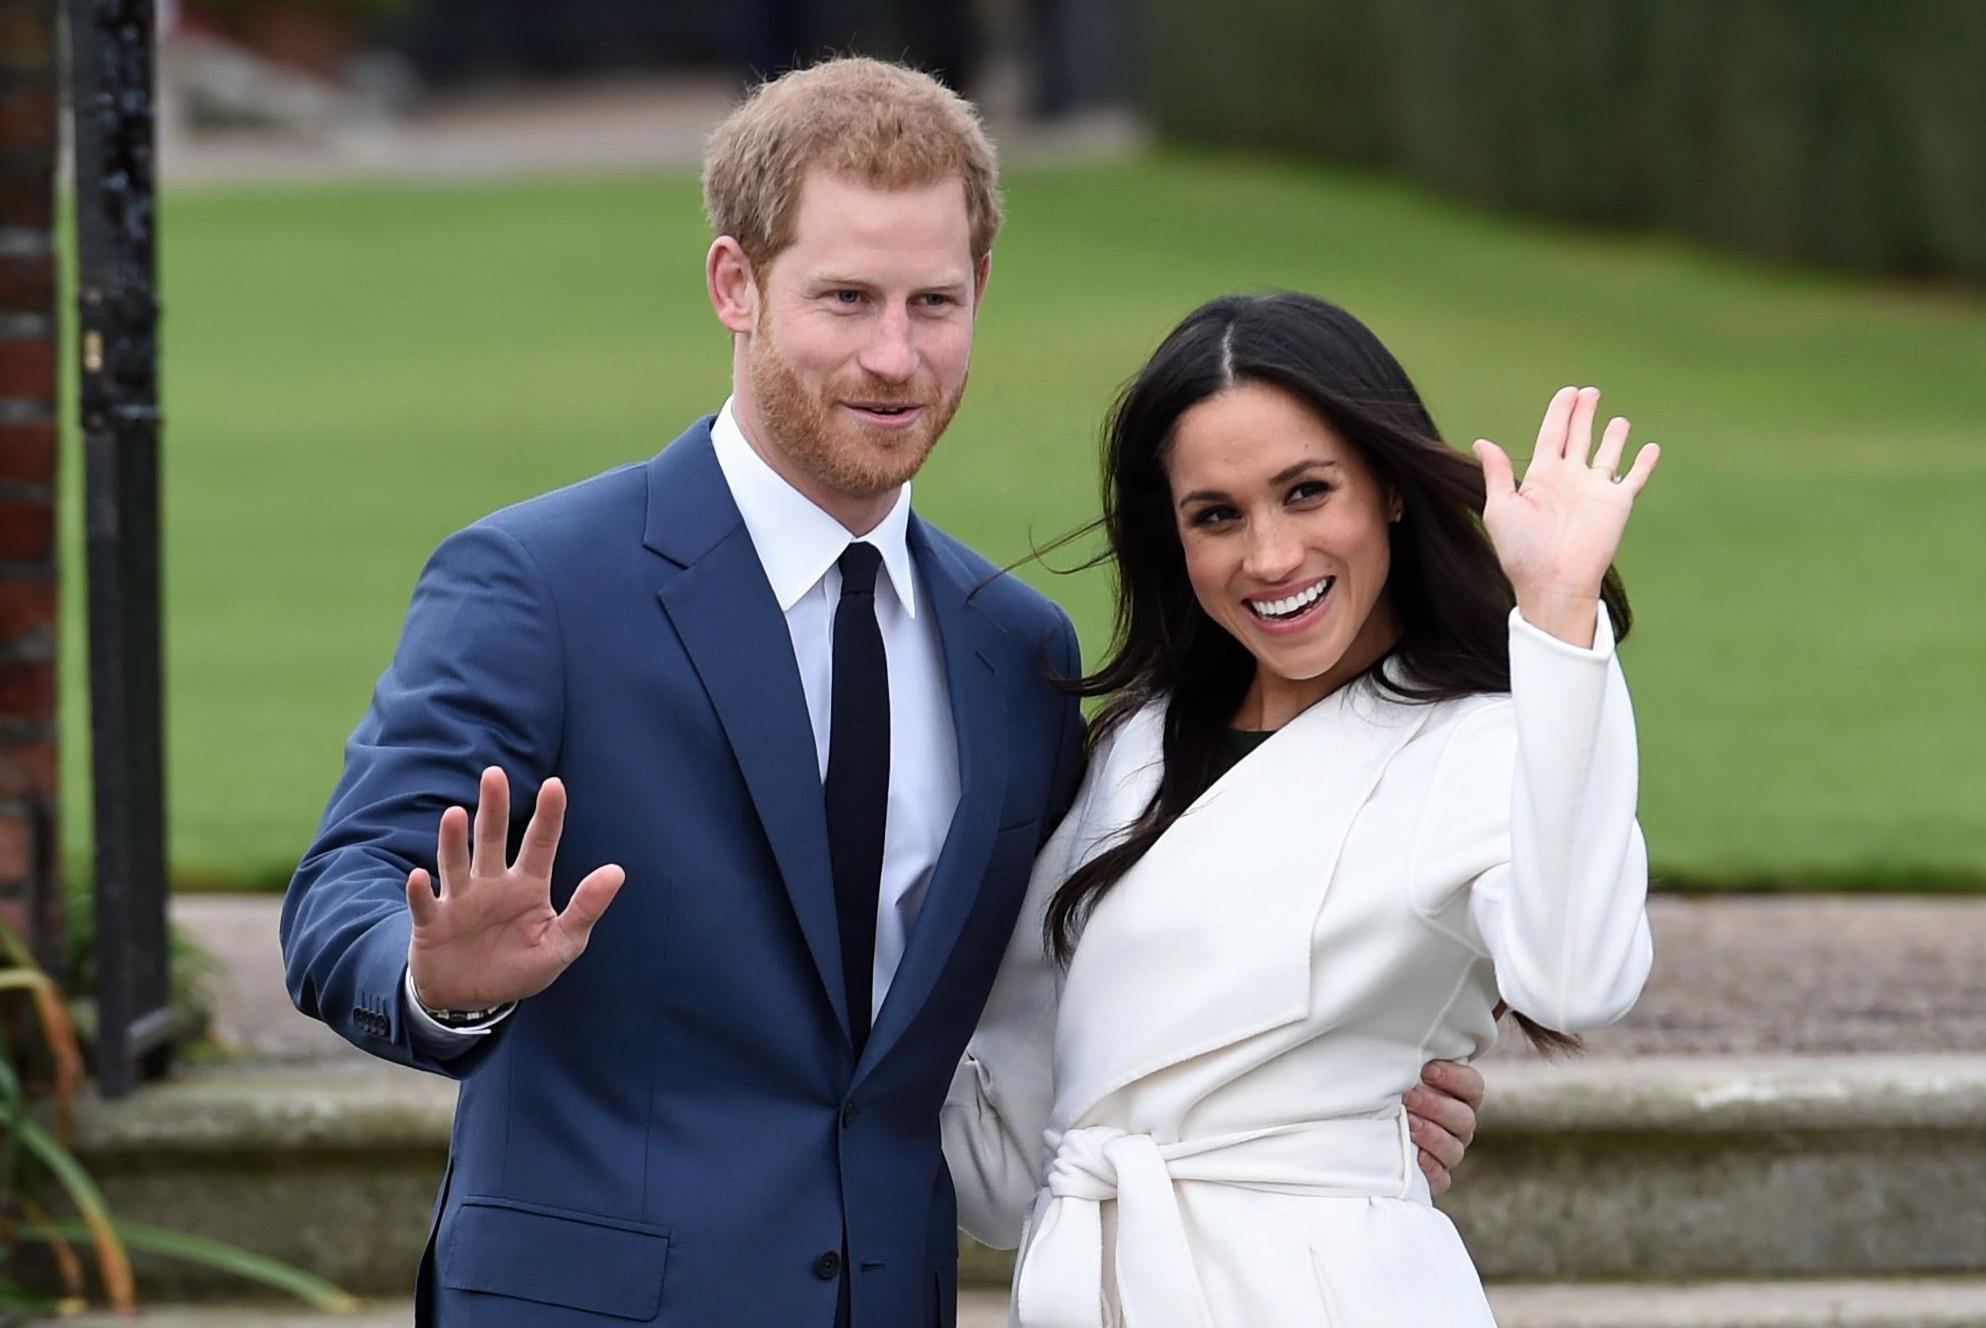 Royal_Wedding-Meghan_Markle_77446-159532.jpg07838060